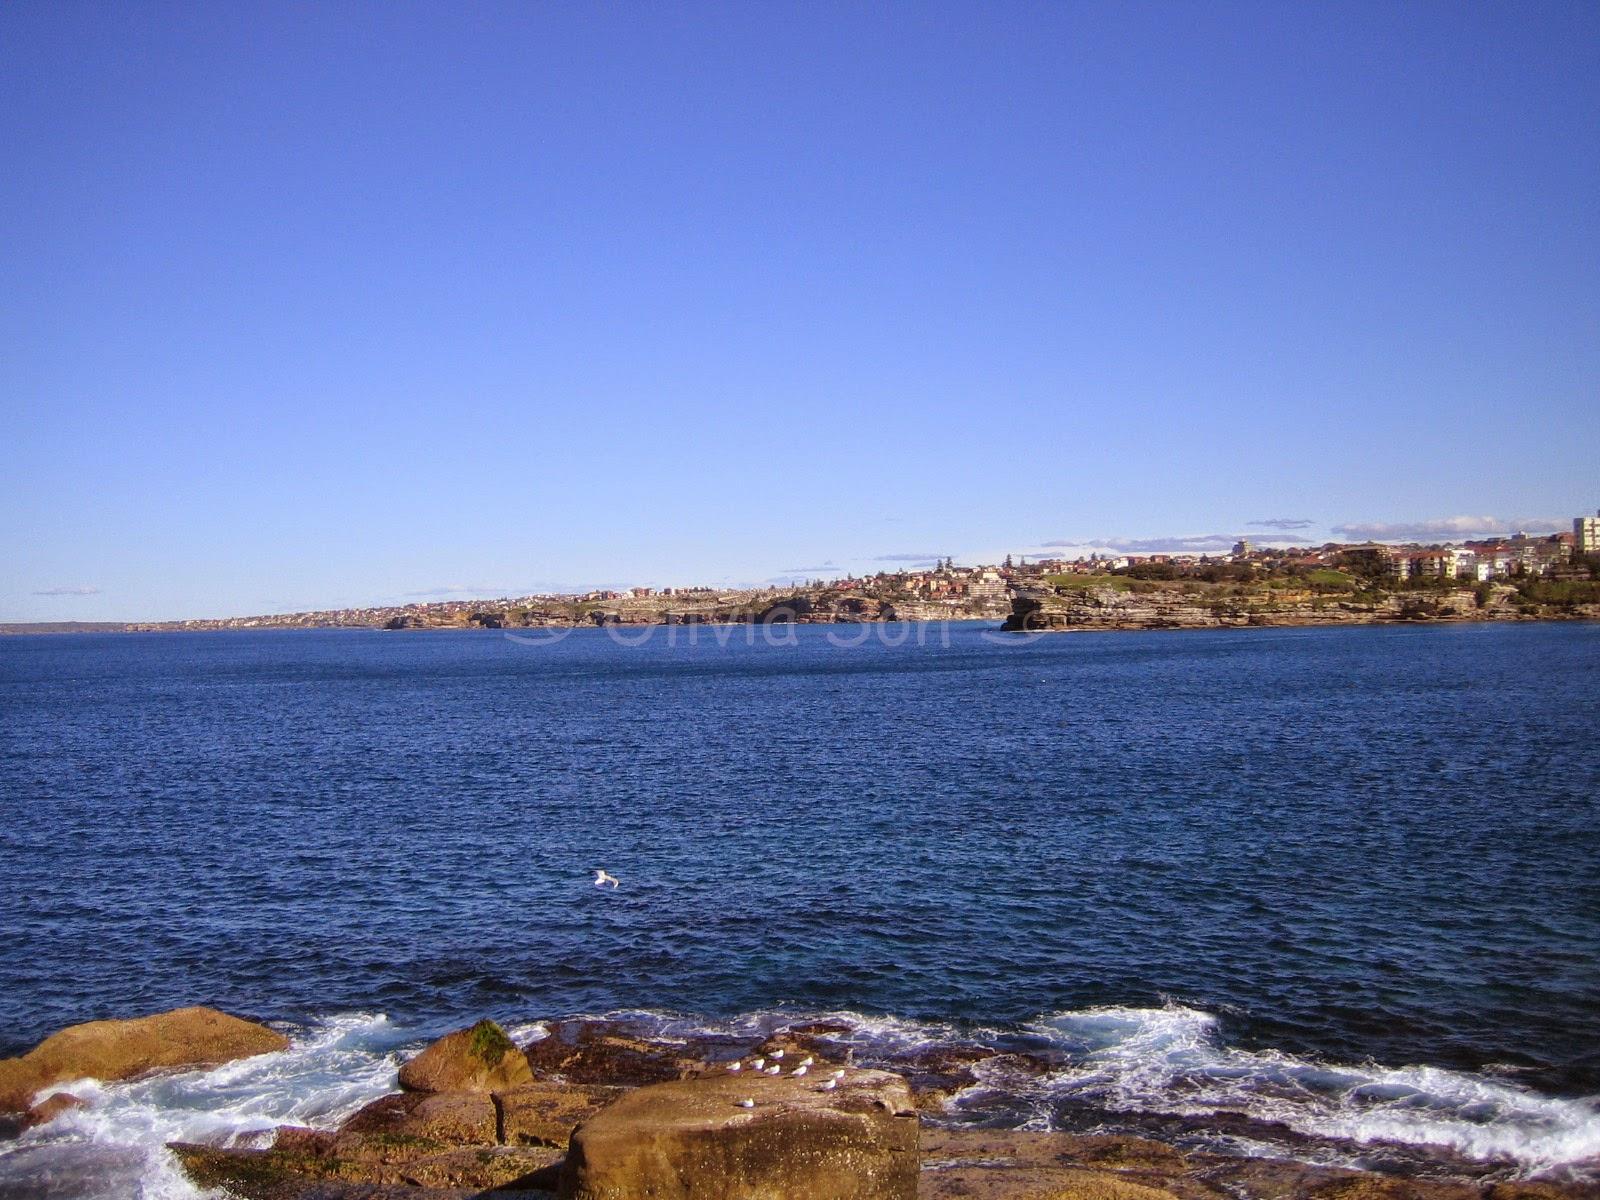 Bondi-Coogee Walk, Sydney, Australie